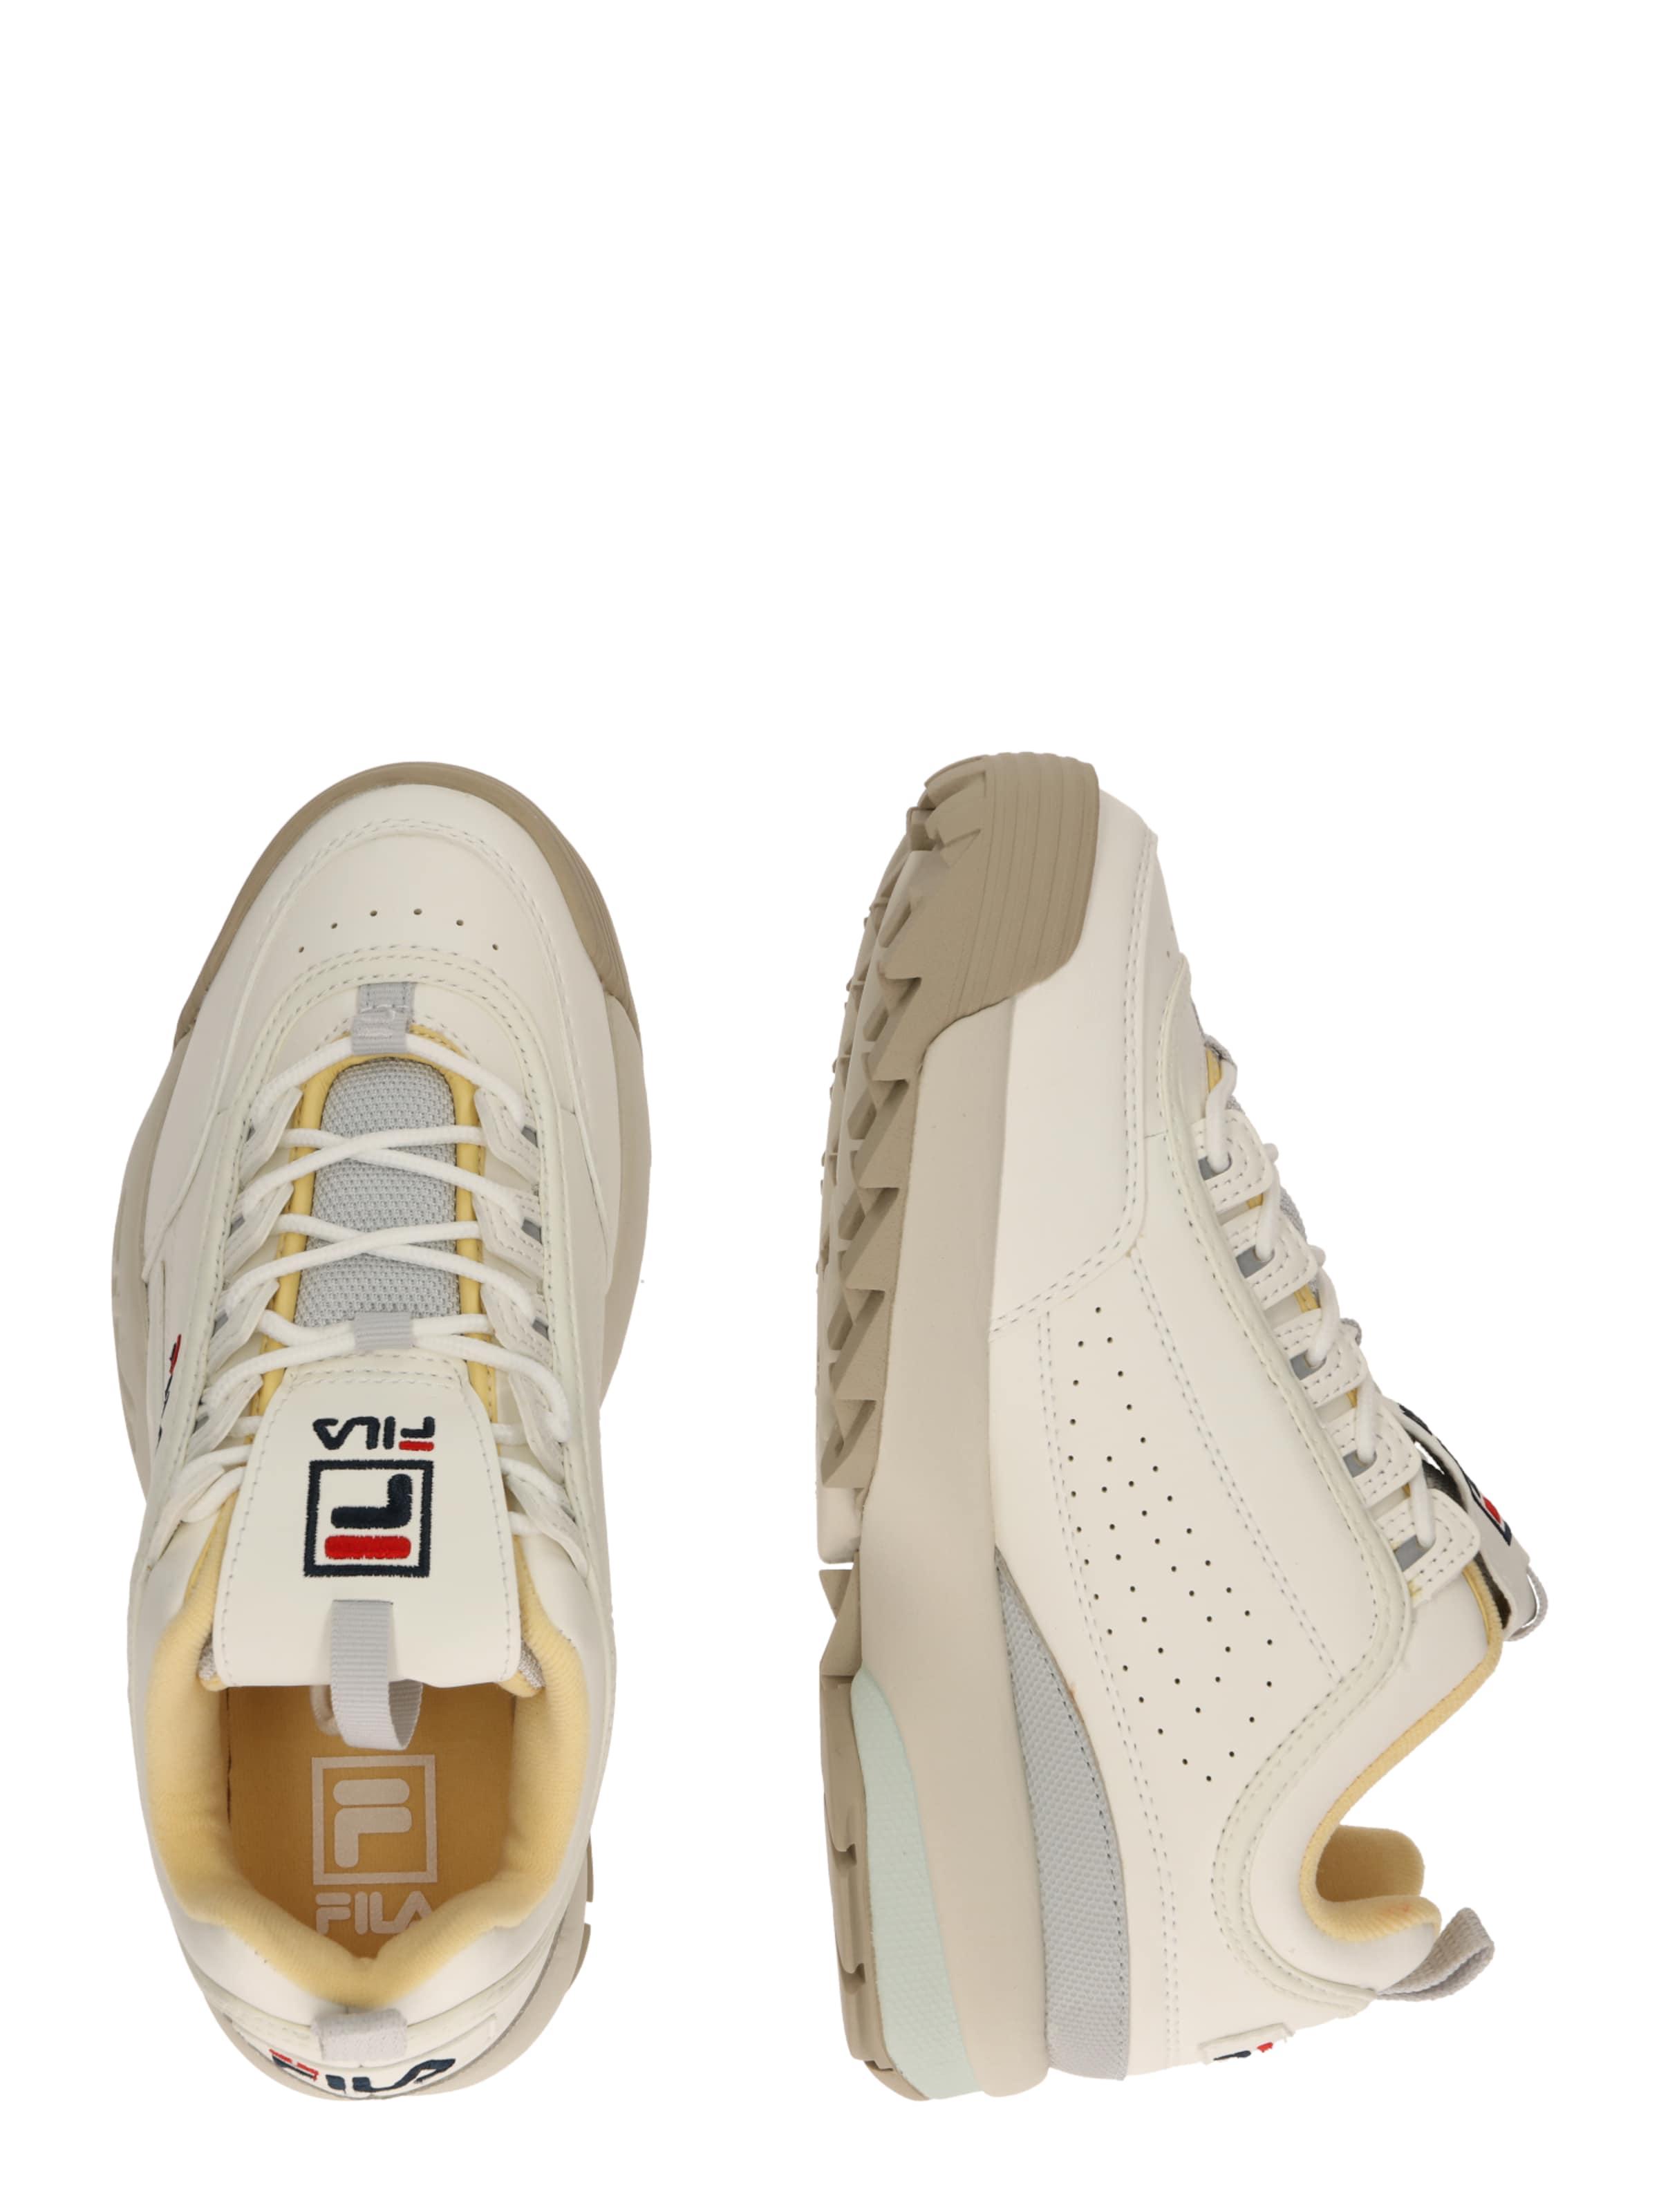 HellgrauOffwhite 'disruptor Fila Cb' Sneaker In OTuwkiXlZP